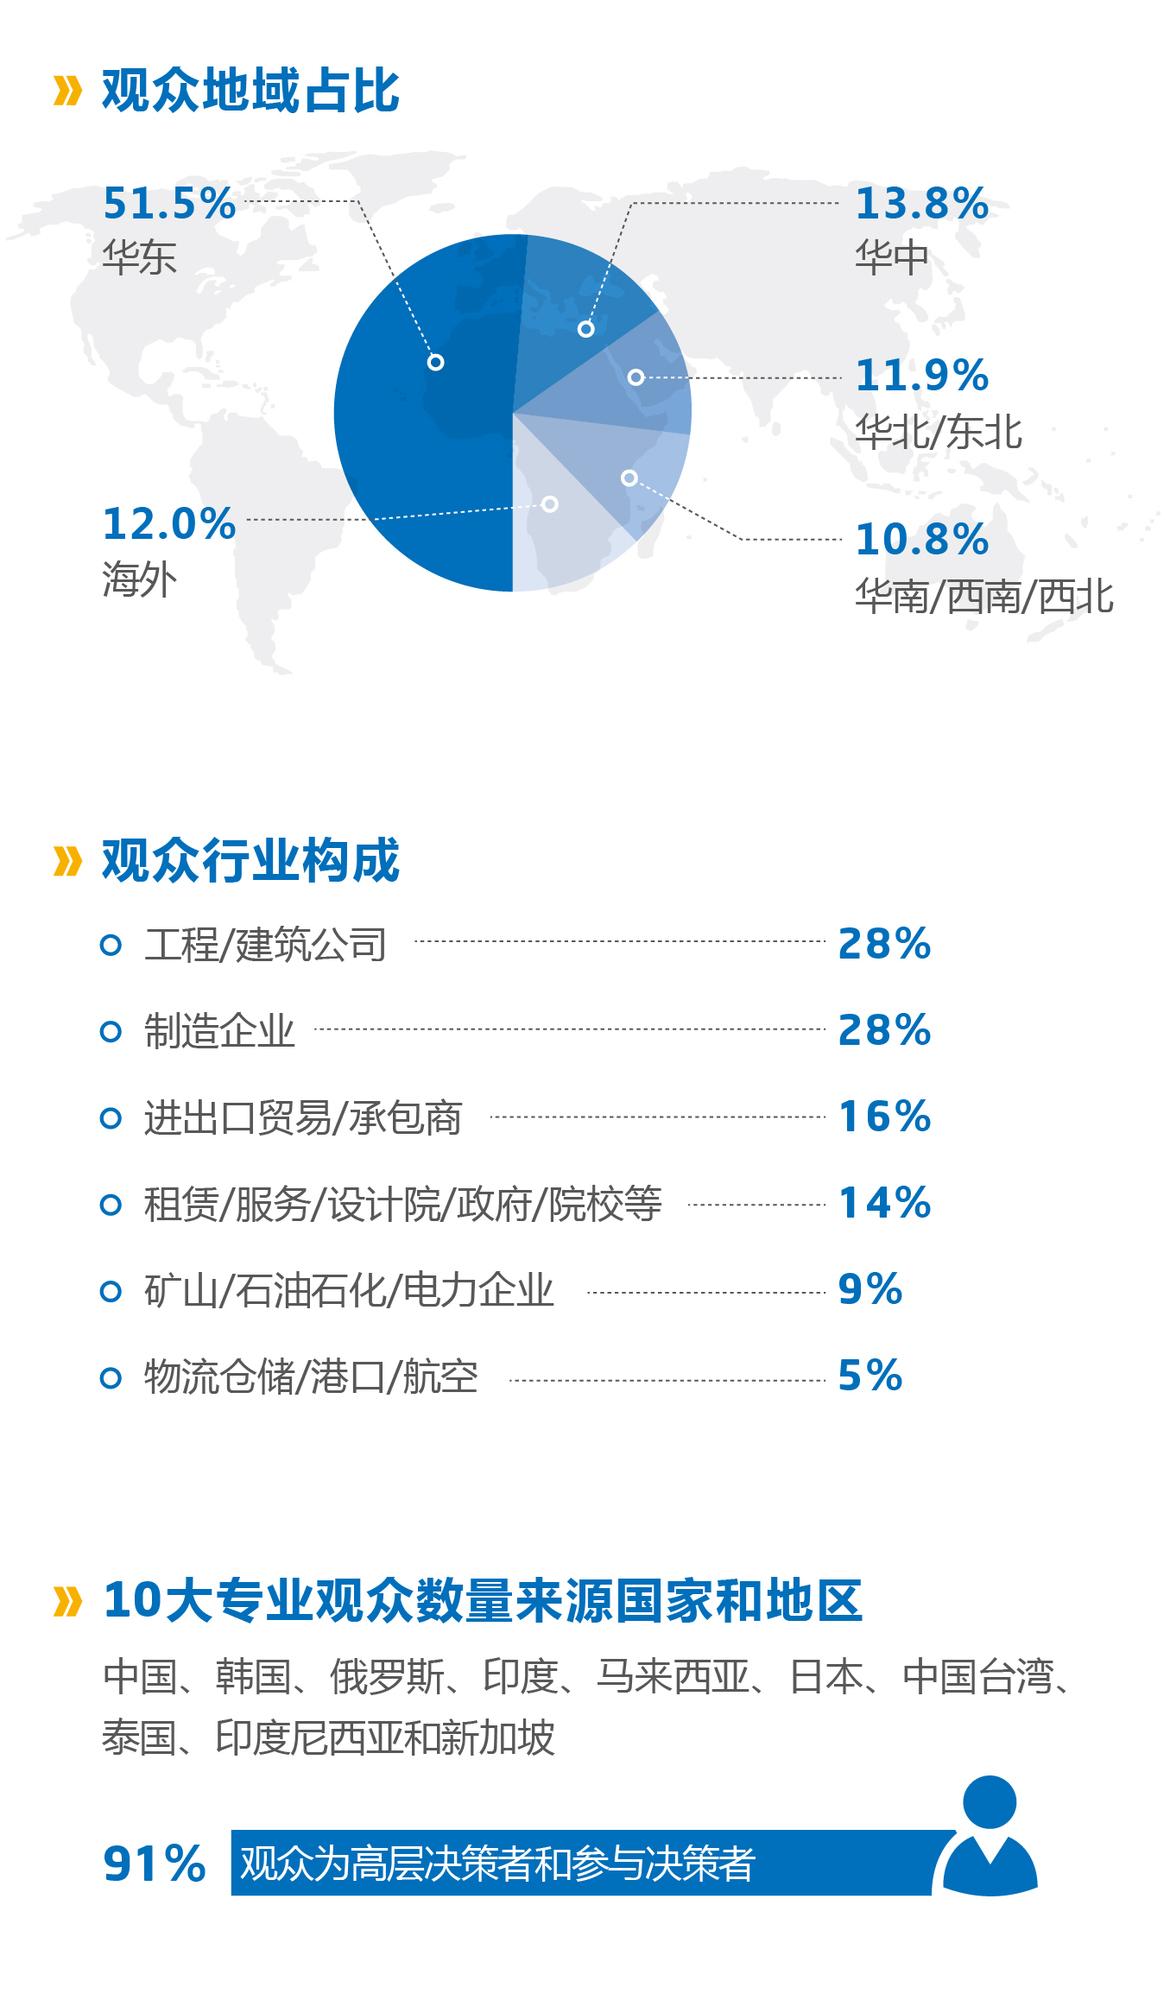 20bC_%E5%BE%AE%E4%BF%A1_%E9%85%8D%E5%9B%BE_%E4%B9%90%E9%AB%98%E5%90%88%E4%BD%9C%E6%A1%88_190514_5.jpg